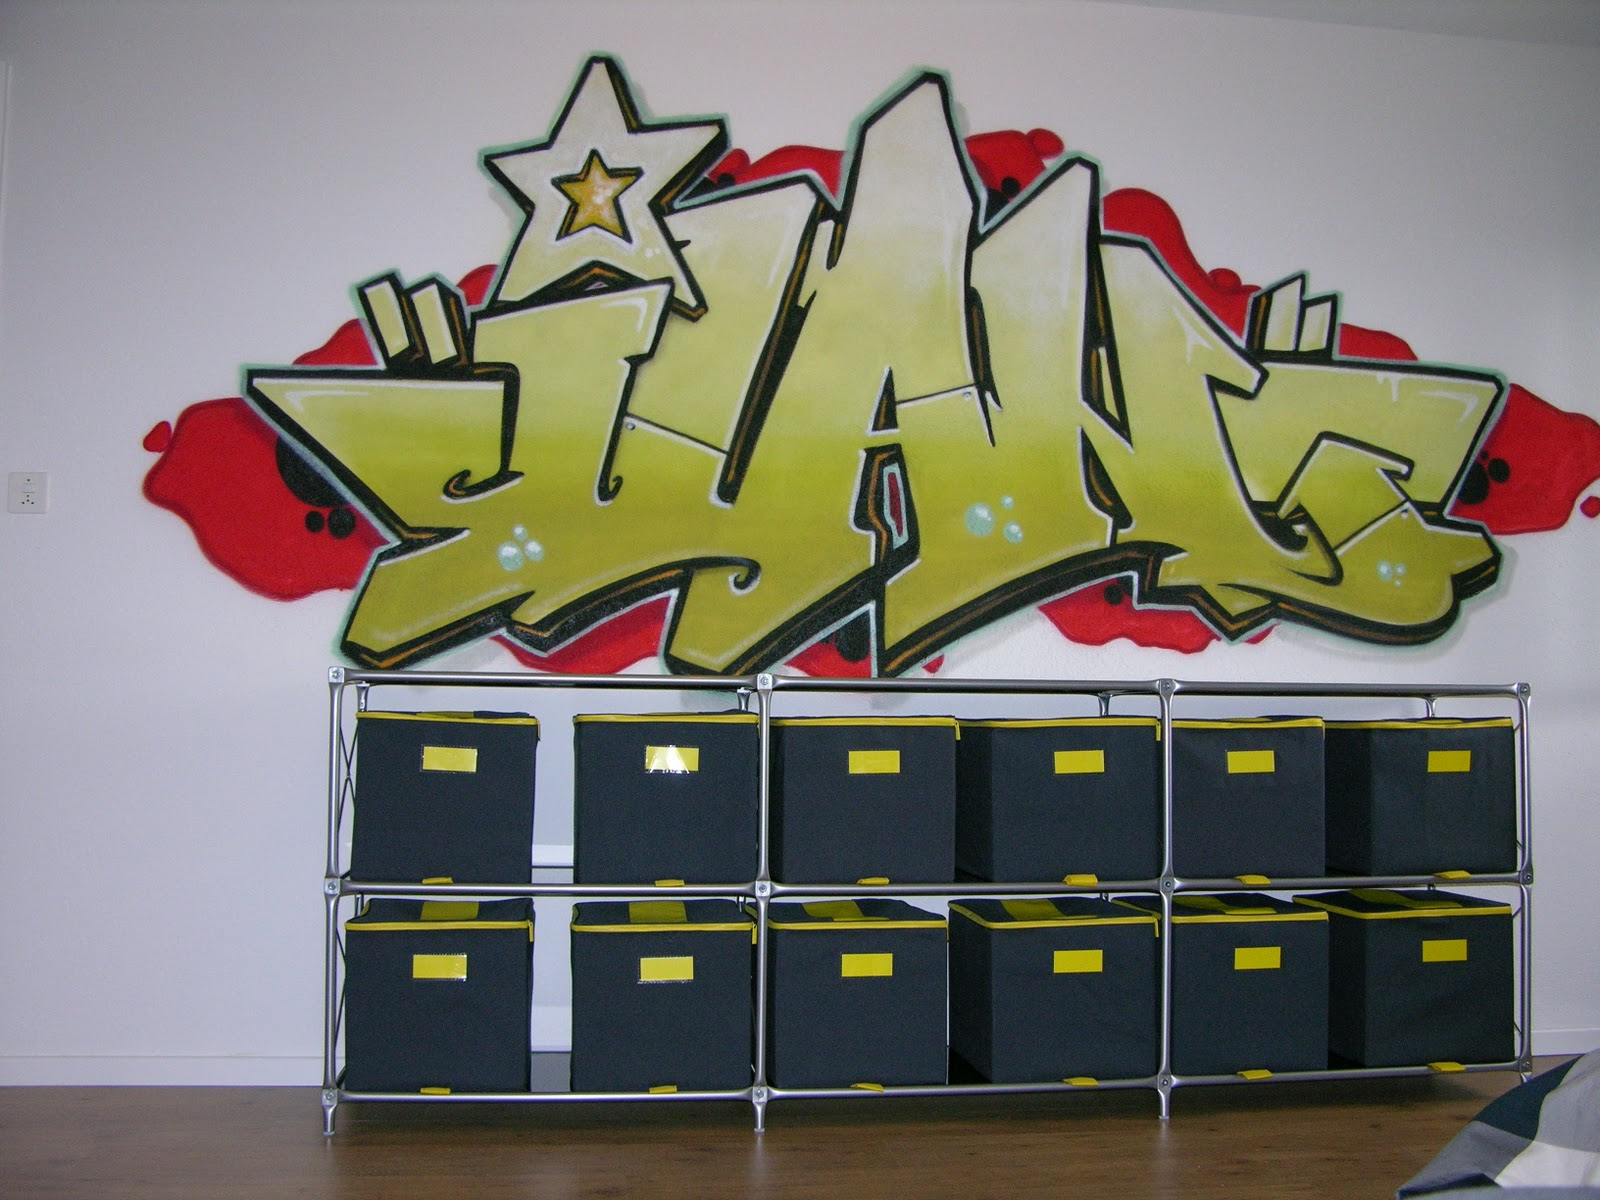 Fribourg enfant graffiti graffeur peint fresque te trompe l 39 oeil - Graffiti prenom gratuit ...